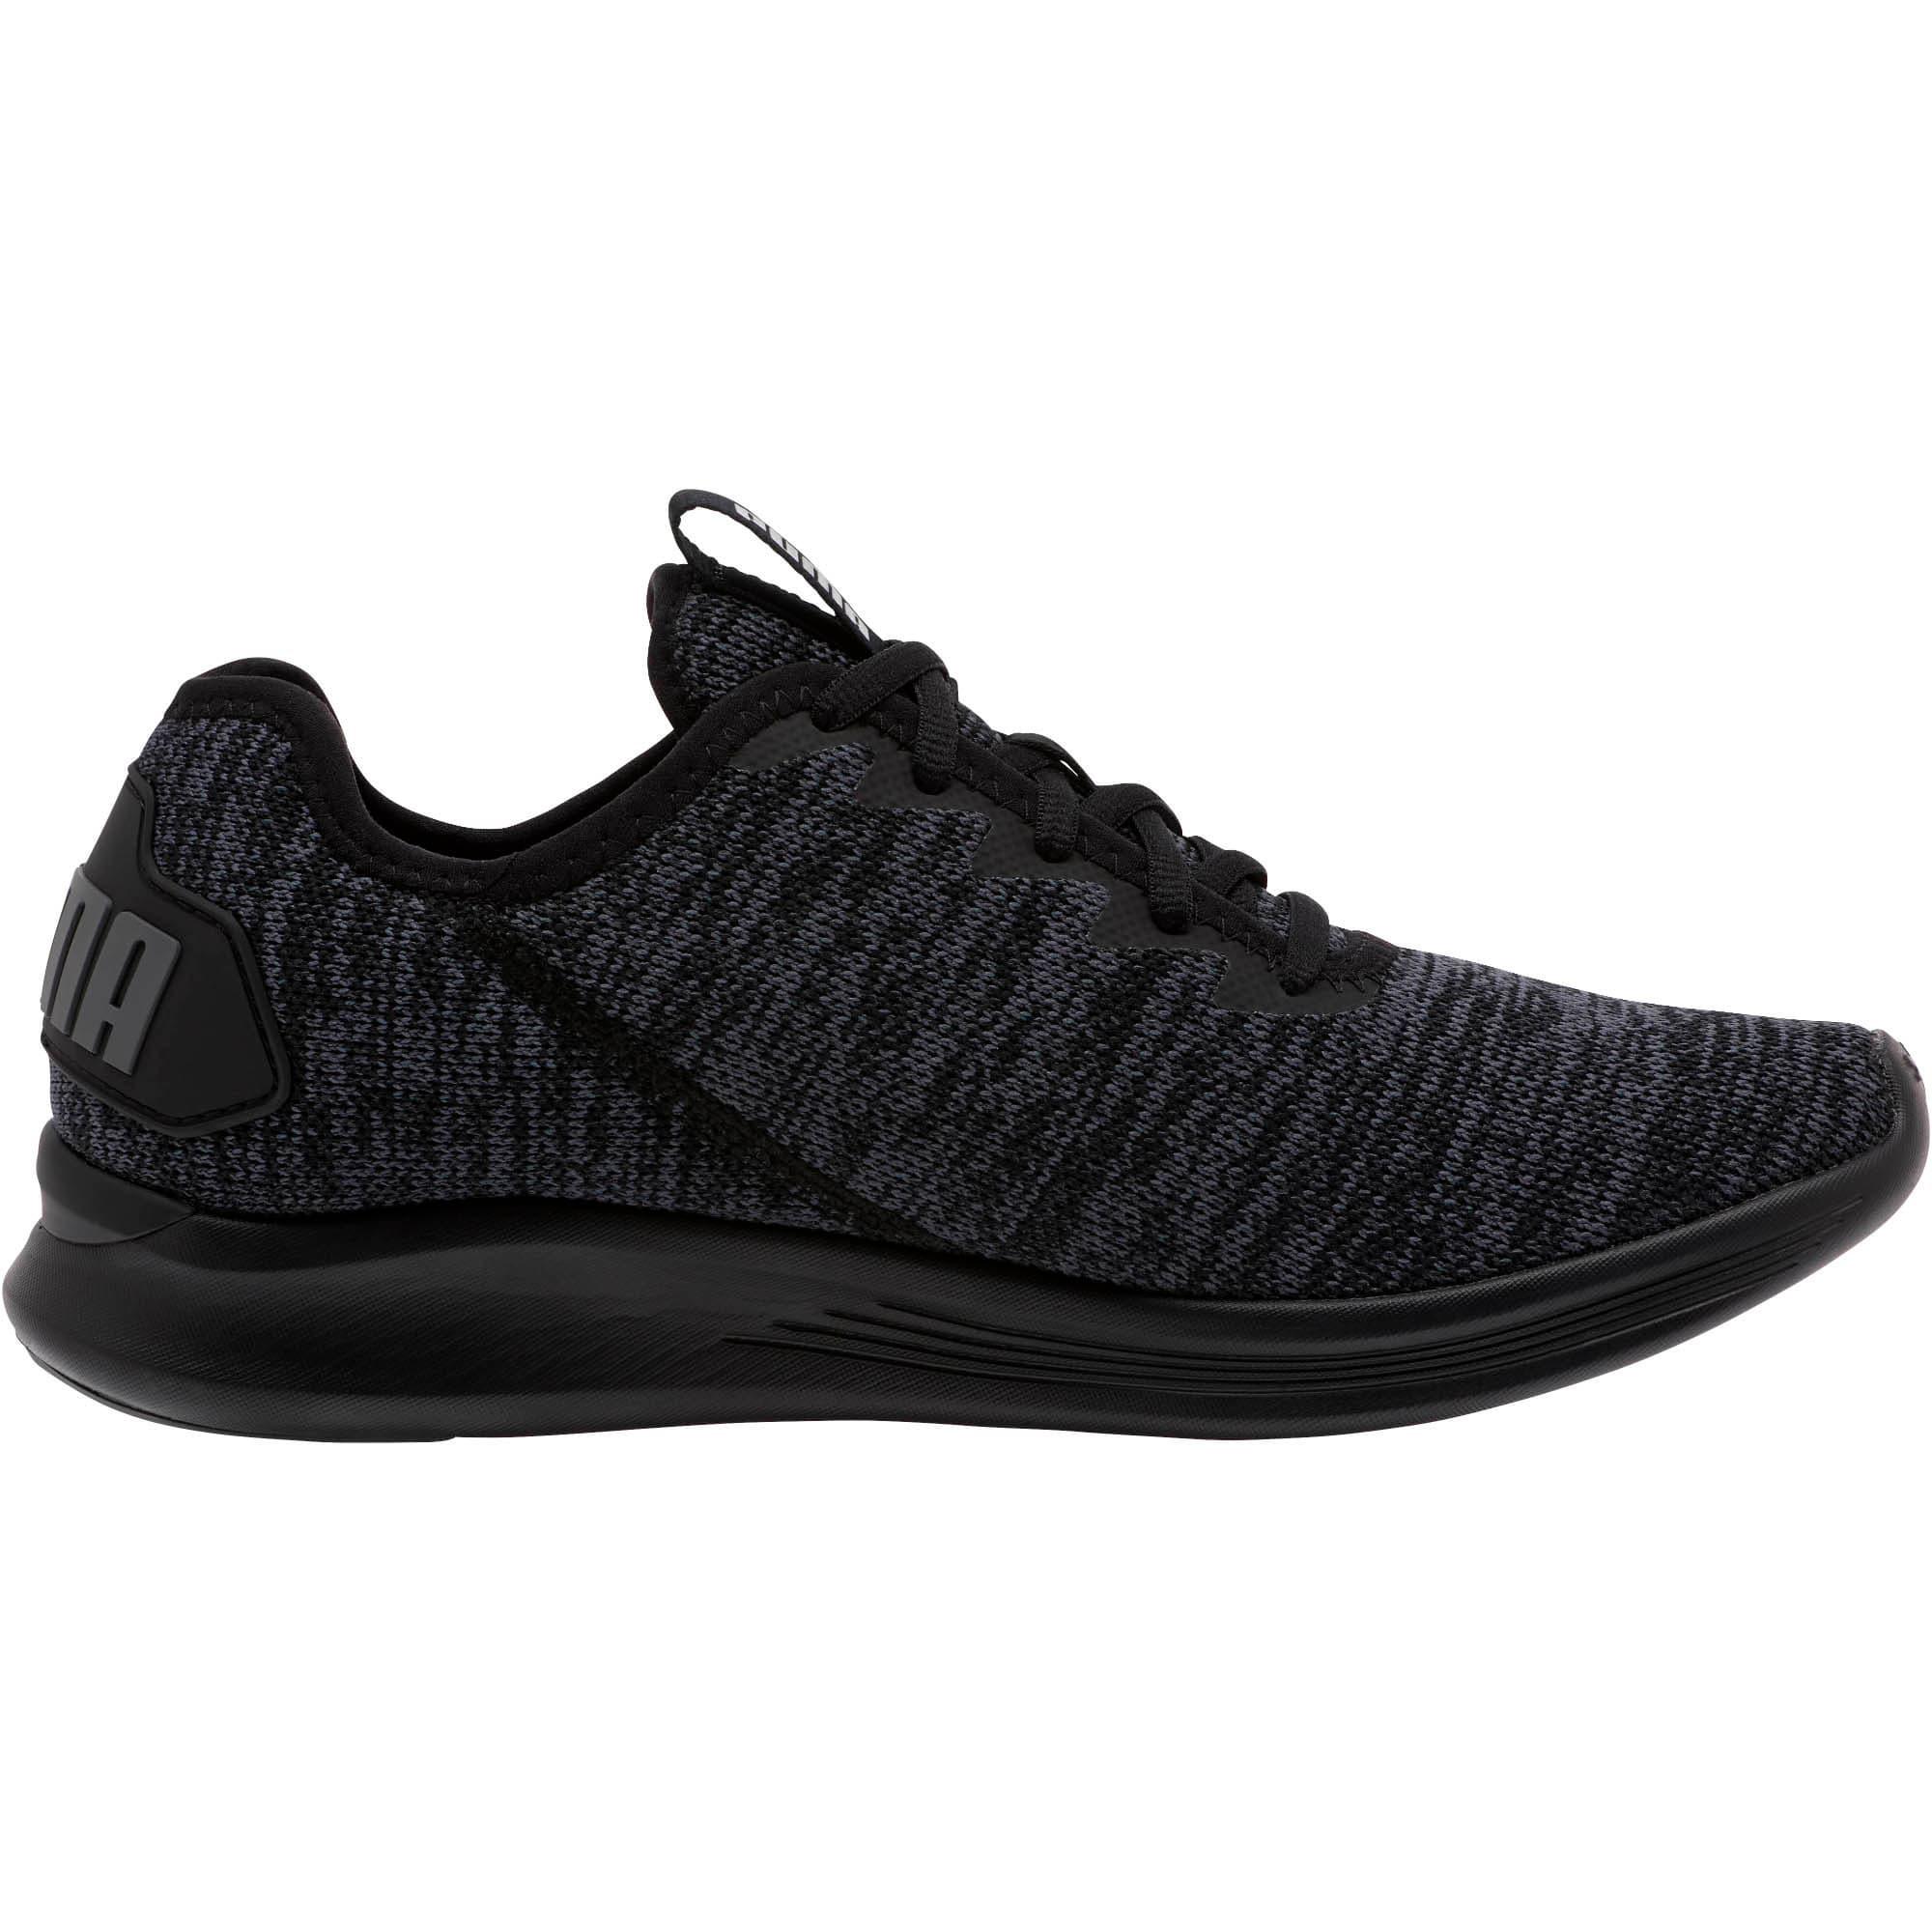 Thumbnail 4 of Ballast Men's Running Shoes, Puma Black-Iron Gate, medium